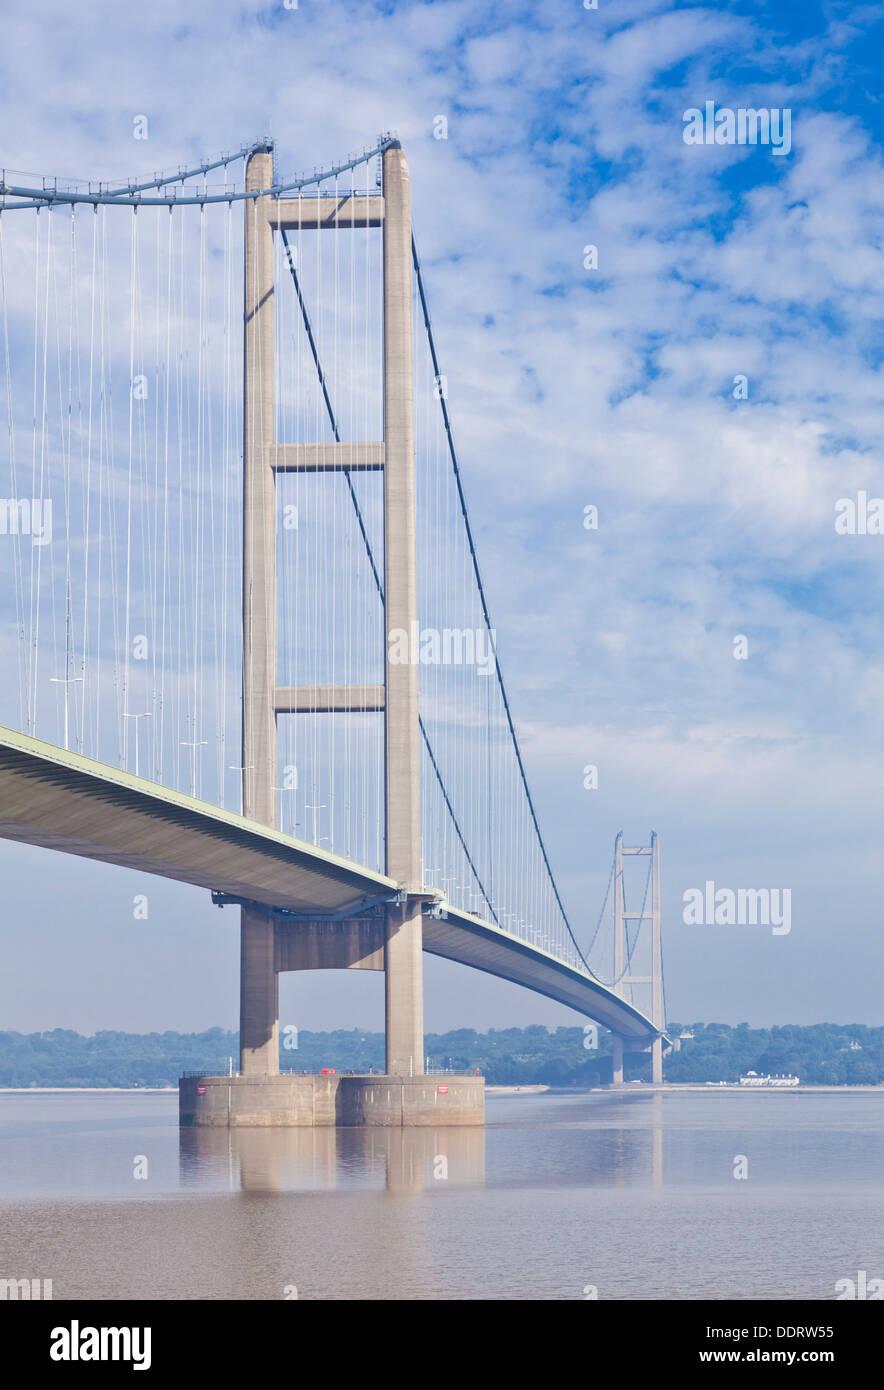 Le Humber Bridge sur la rivière Humber Humberside East England UK GB EU Europe Banque D'Images